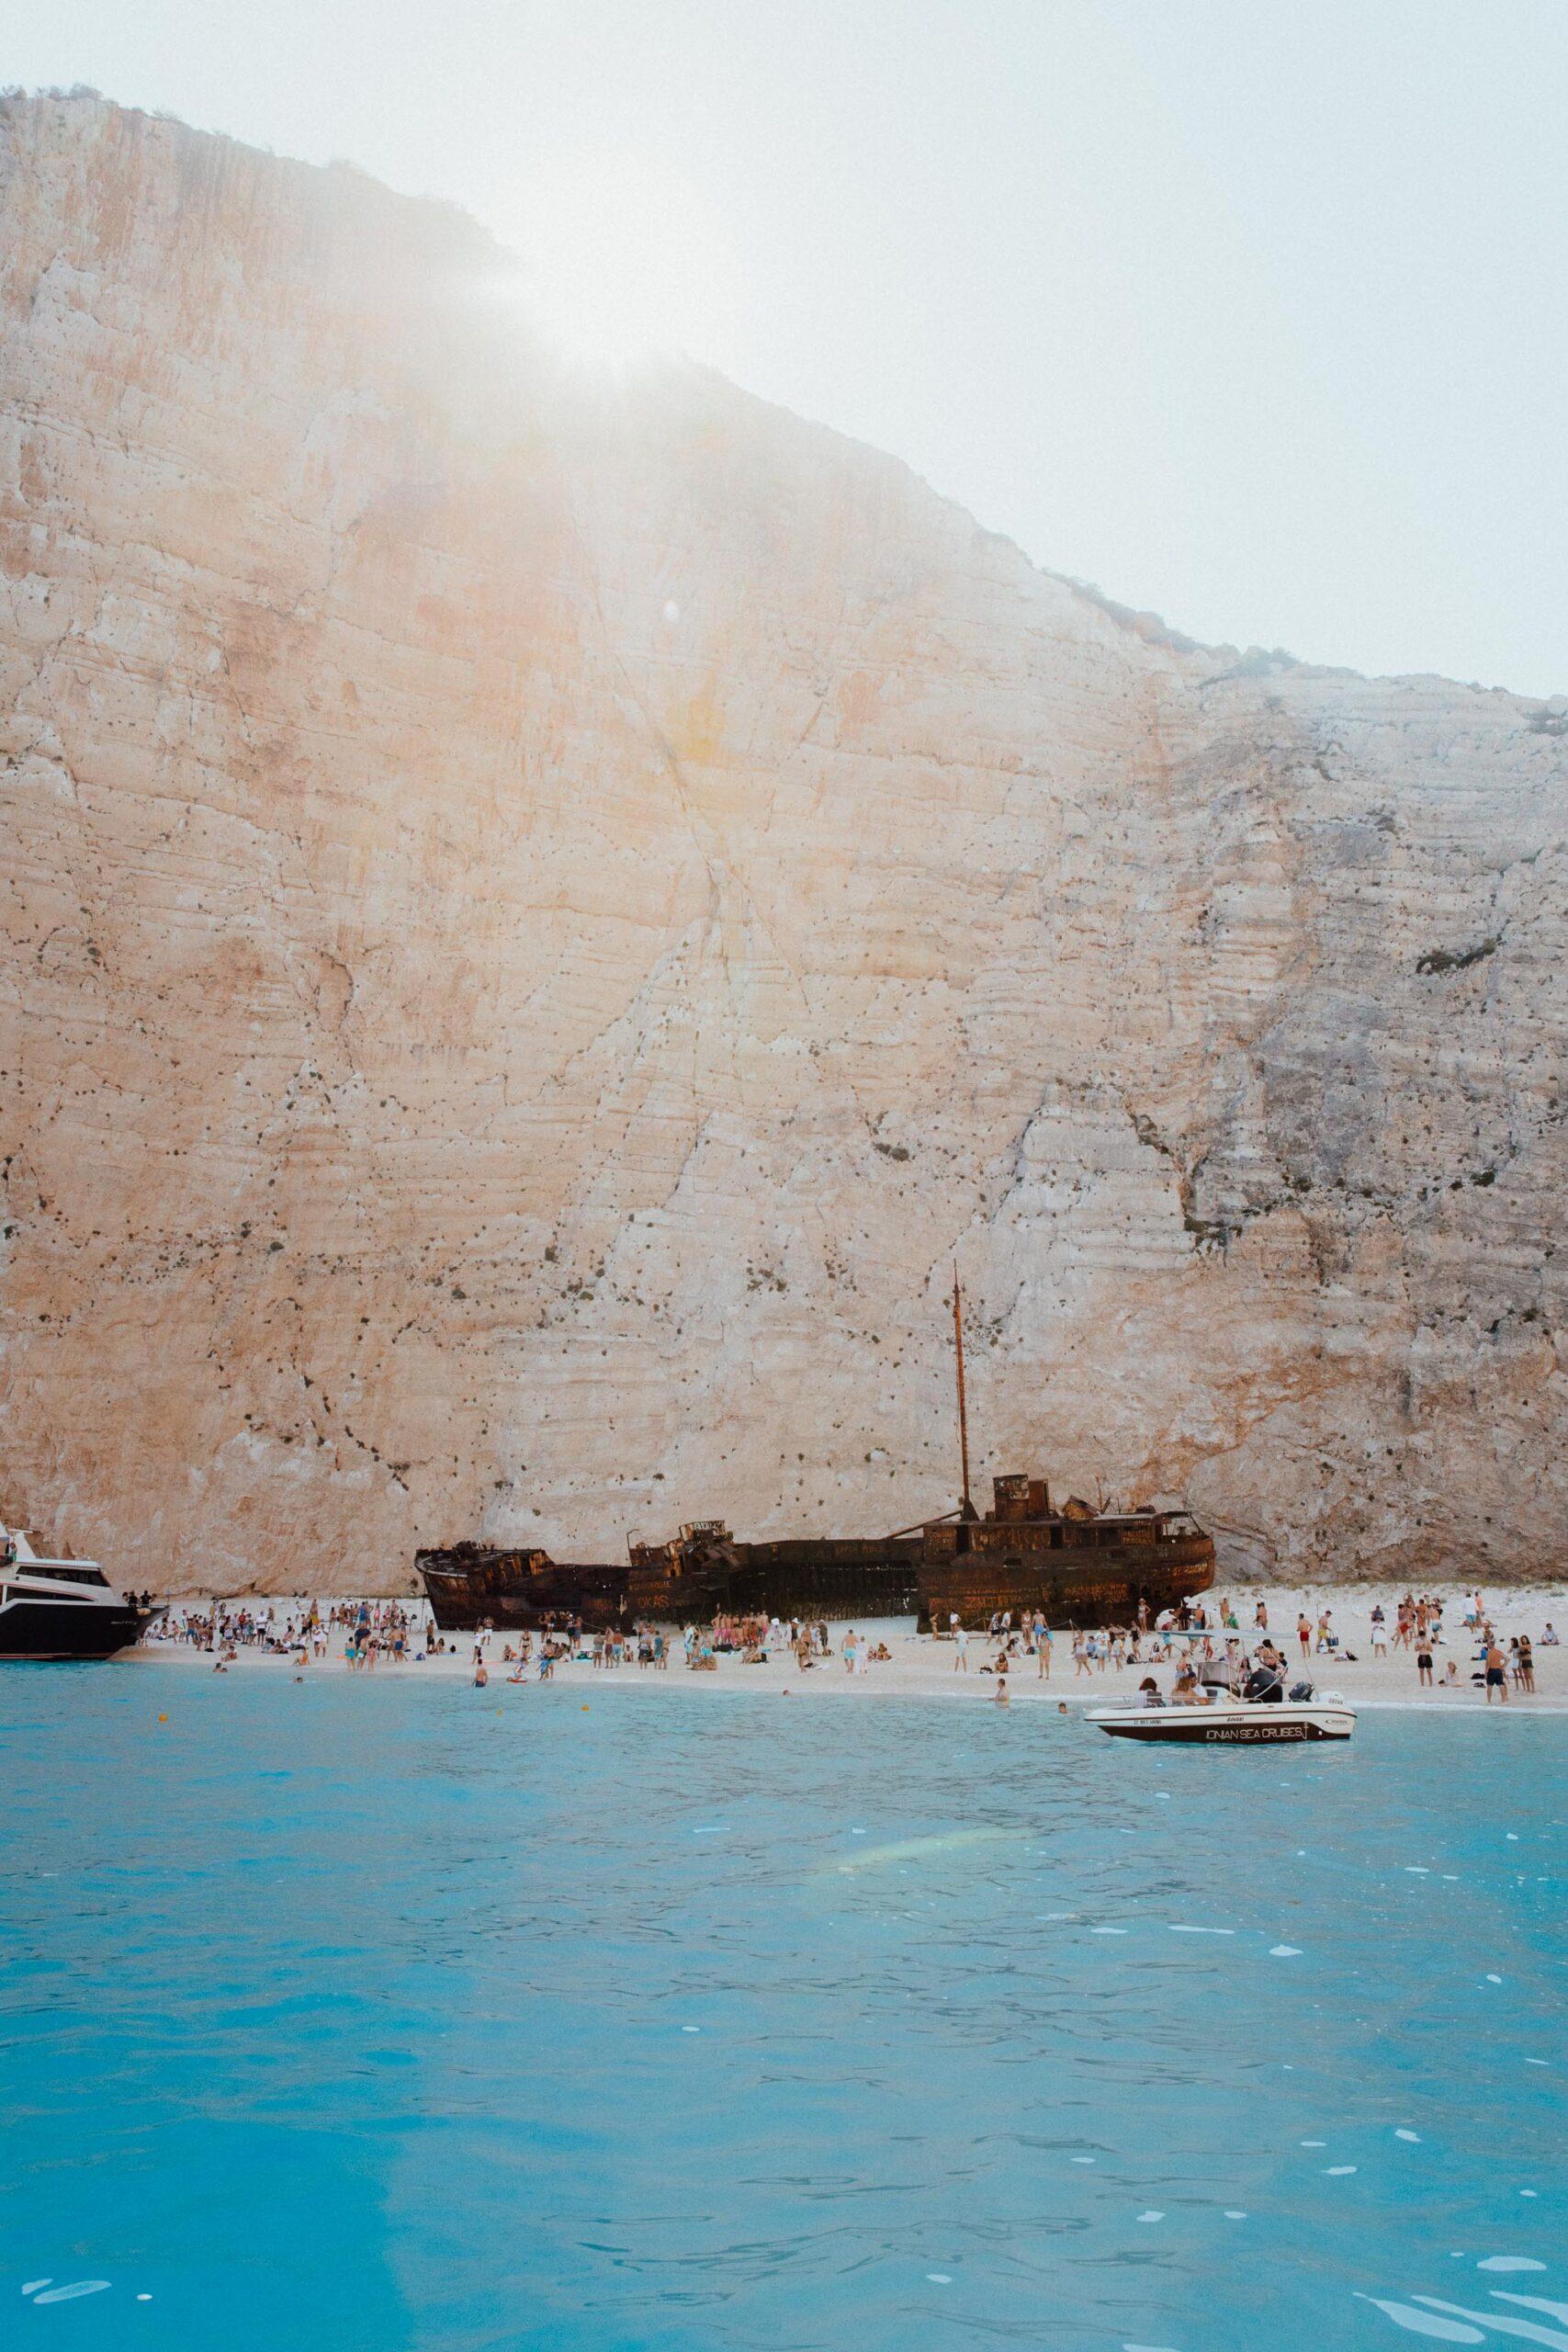 Navagio shipwreck beach boat in Zakynthos Greece